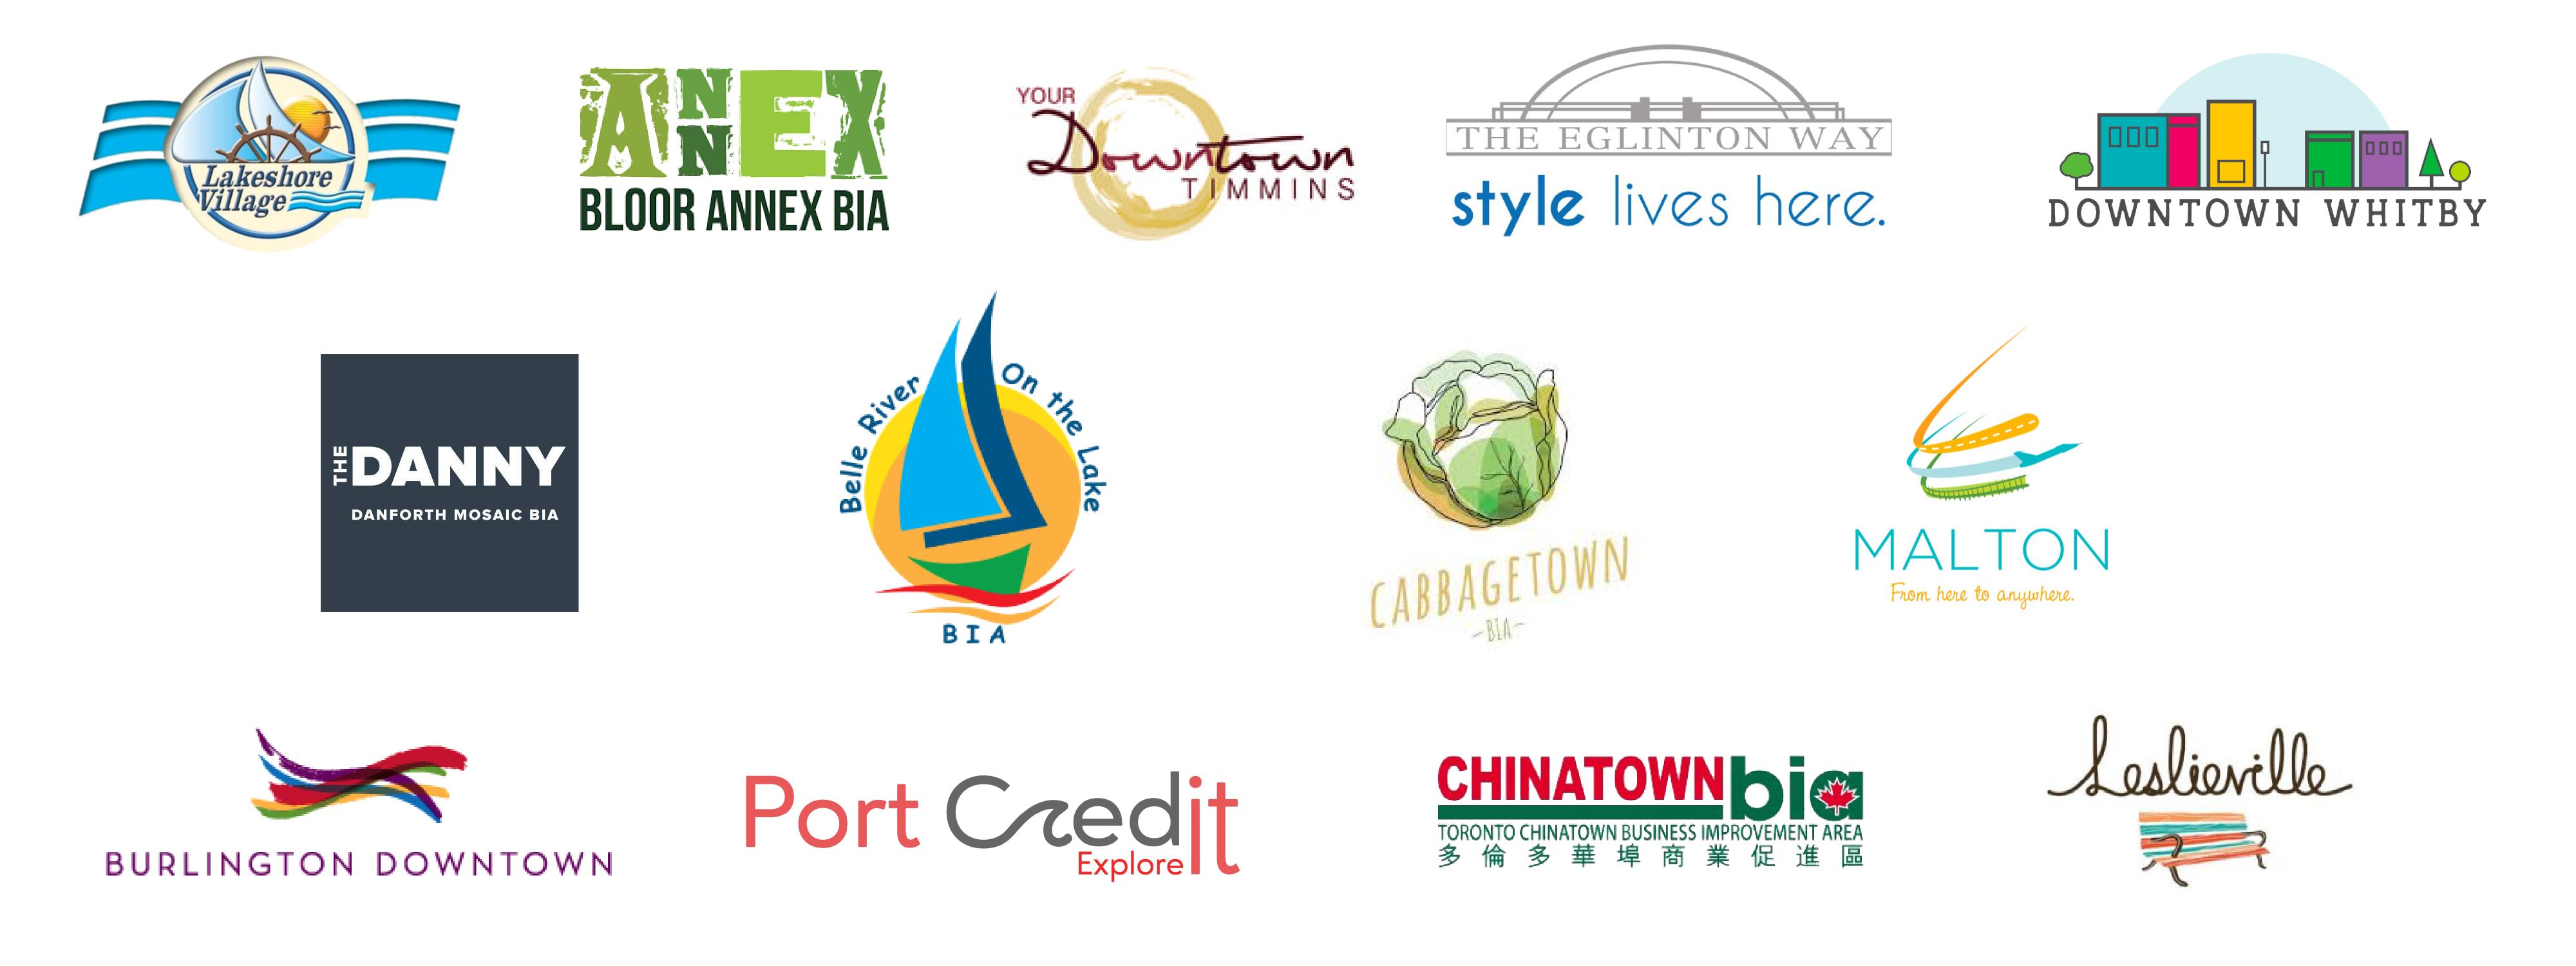 Main Street BIA client logos including Lakeshore Village, Bloor Annex, Timmins, Eglinton Way, Whitby, Danforth, Belle River, Cabbagetown, Malton, Burlington, Port Credit, Chinatown, Leslieville